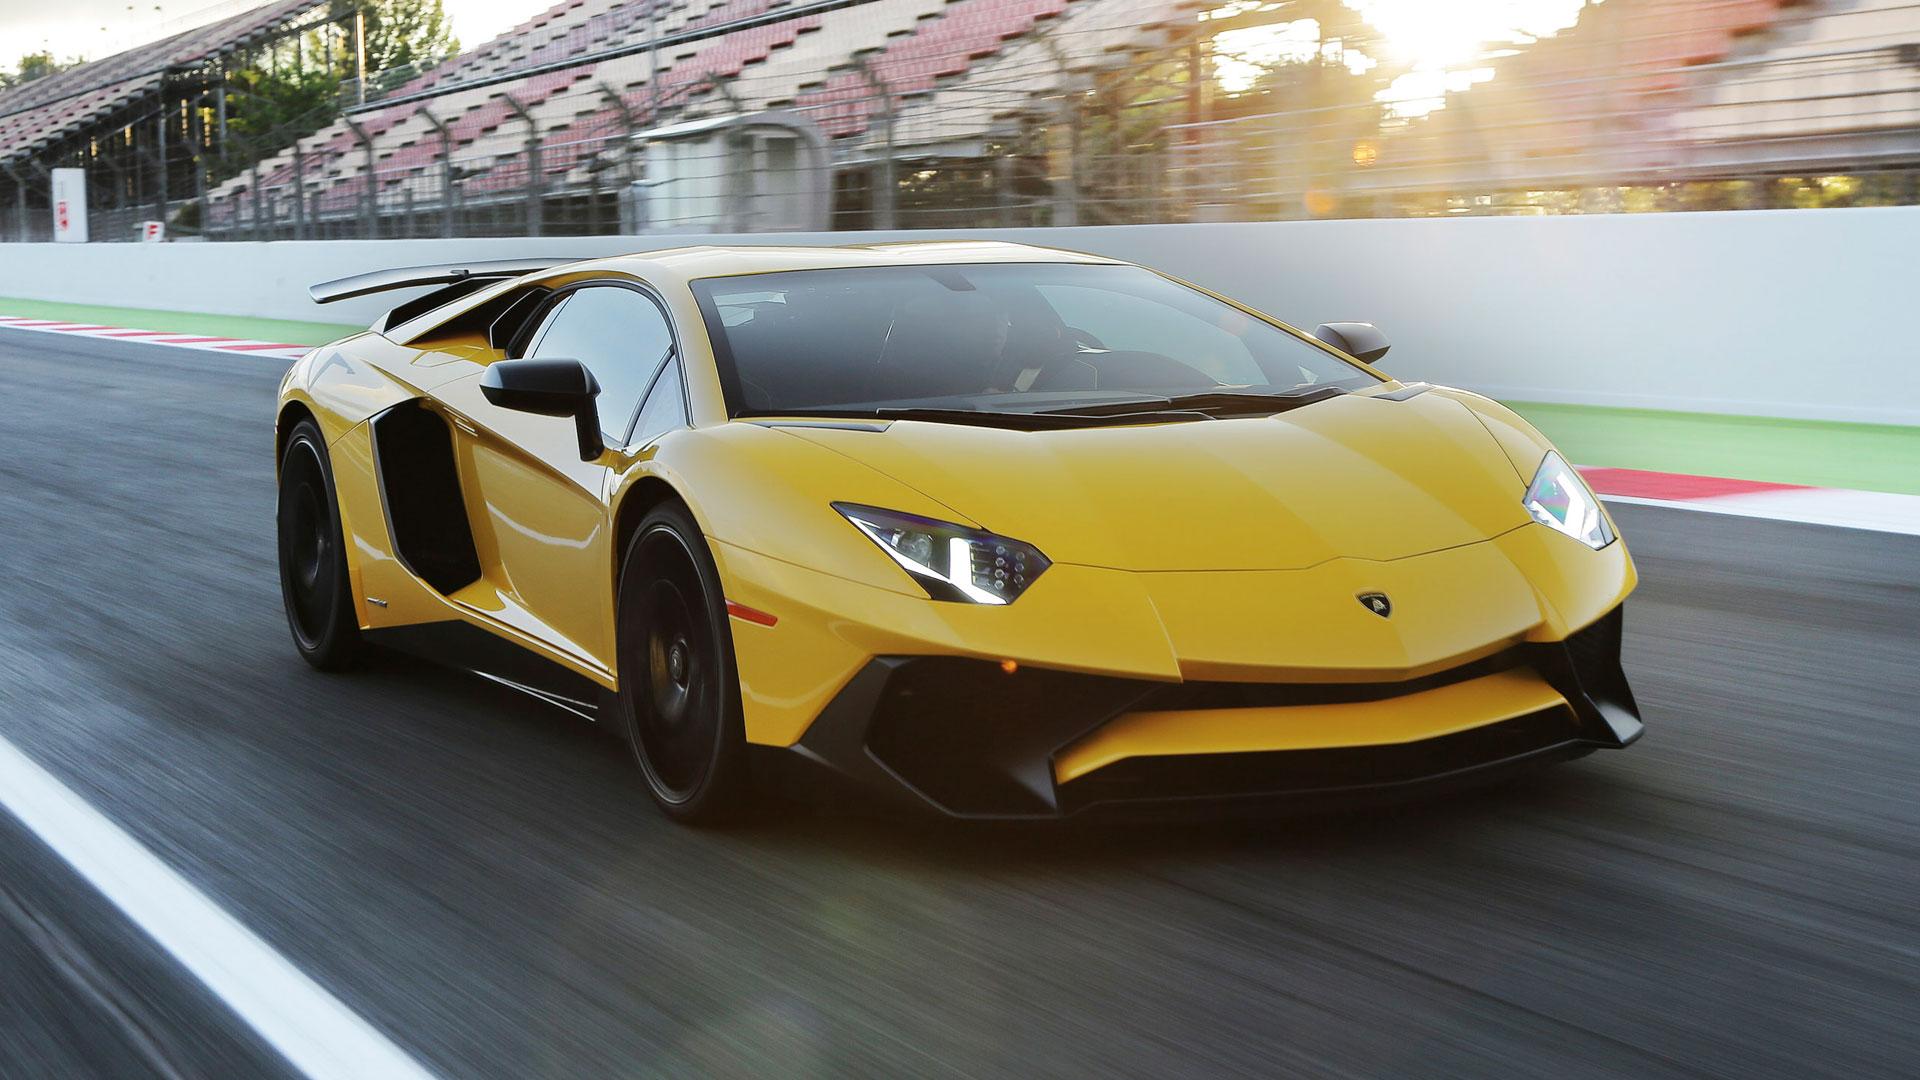 Lamborghini Aventador SV - greatest cars of the decade